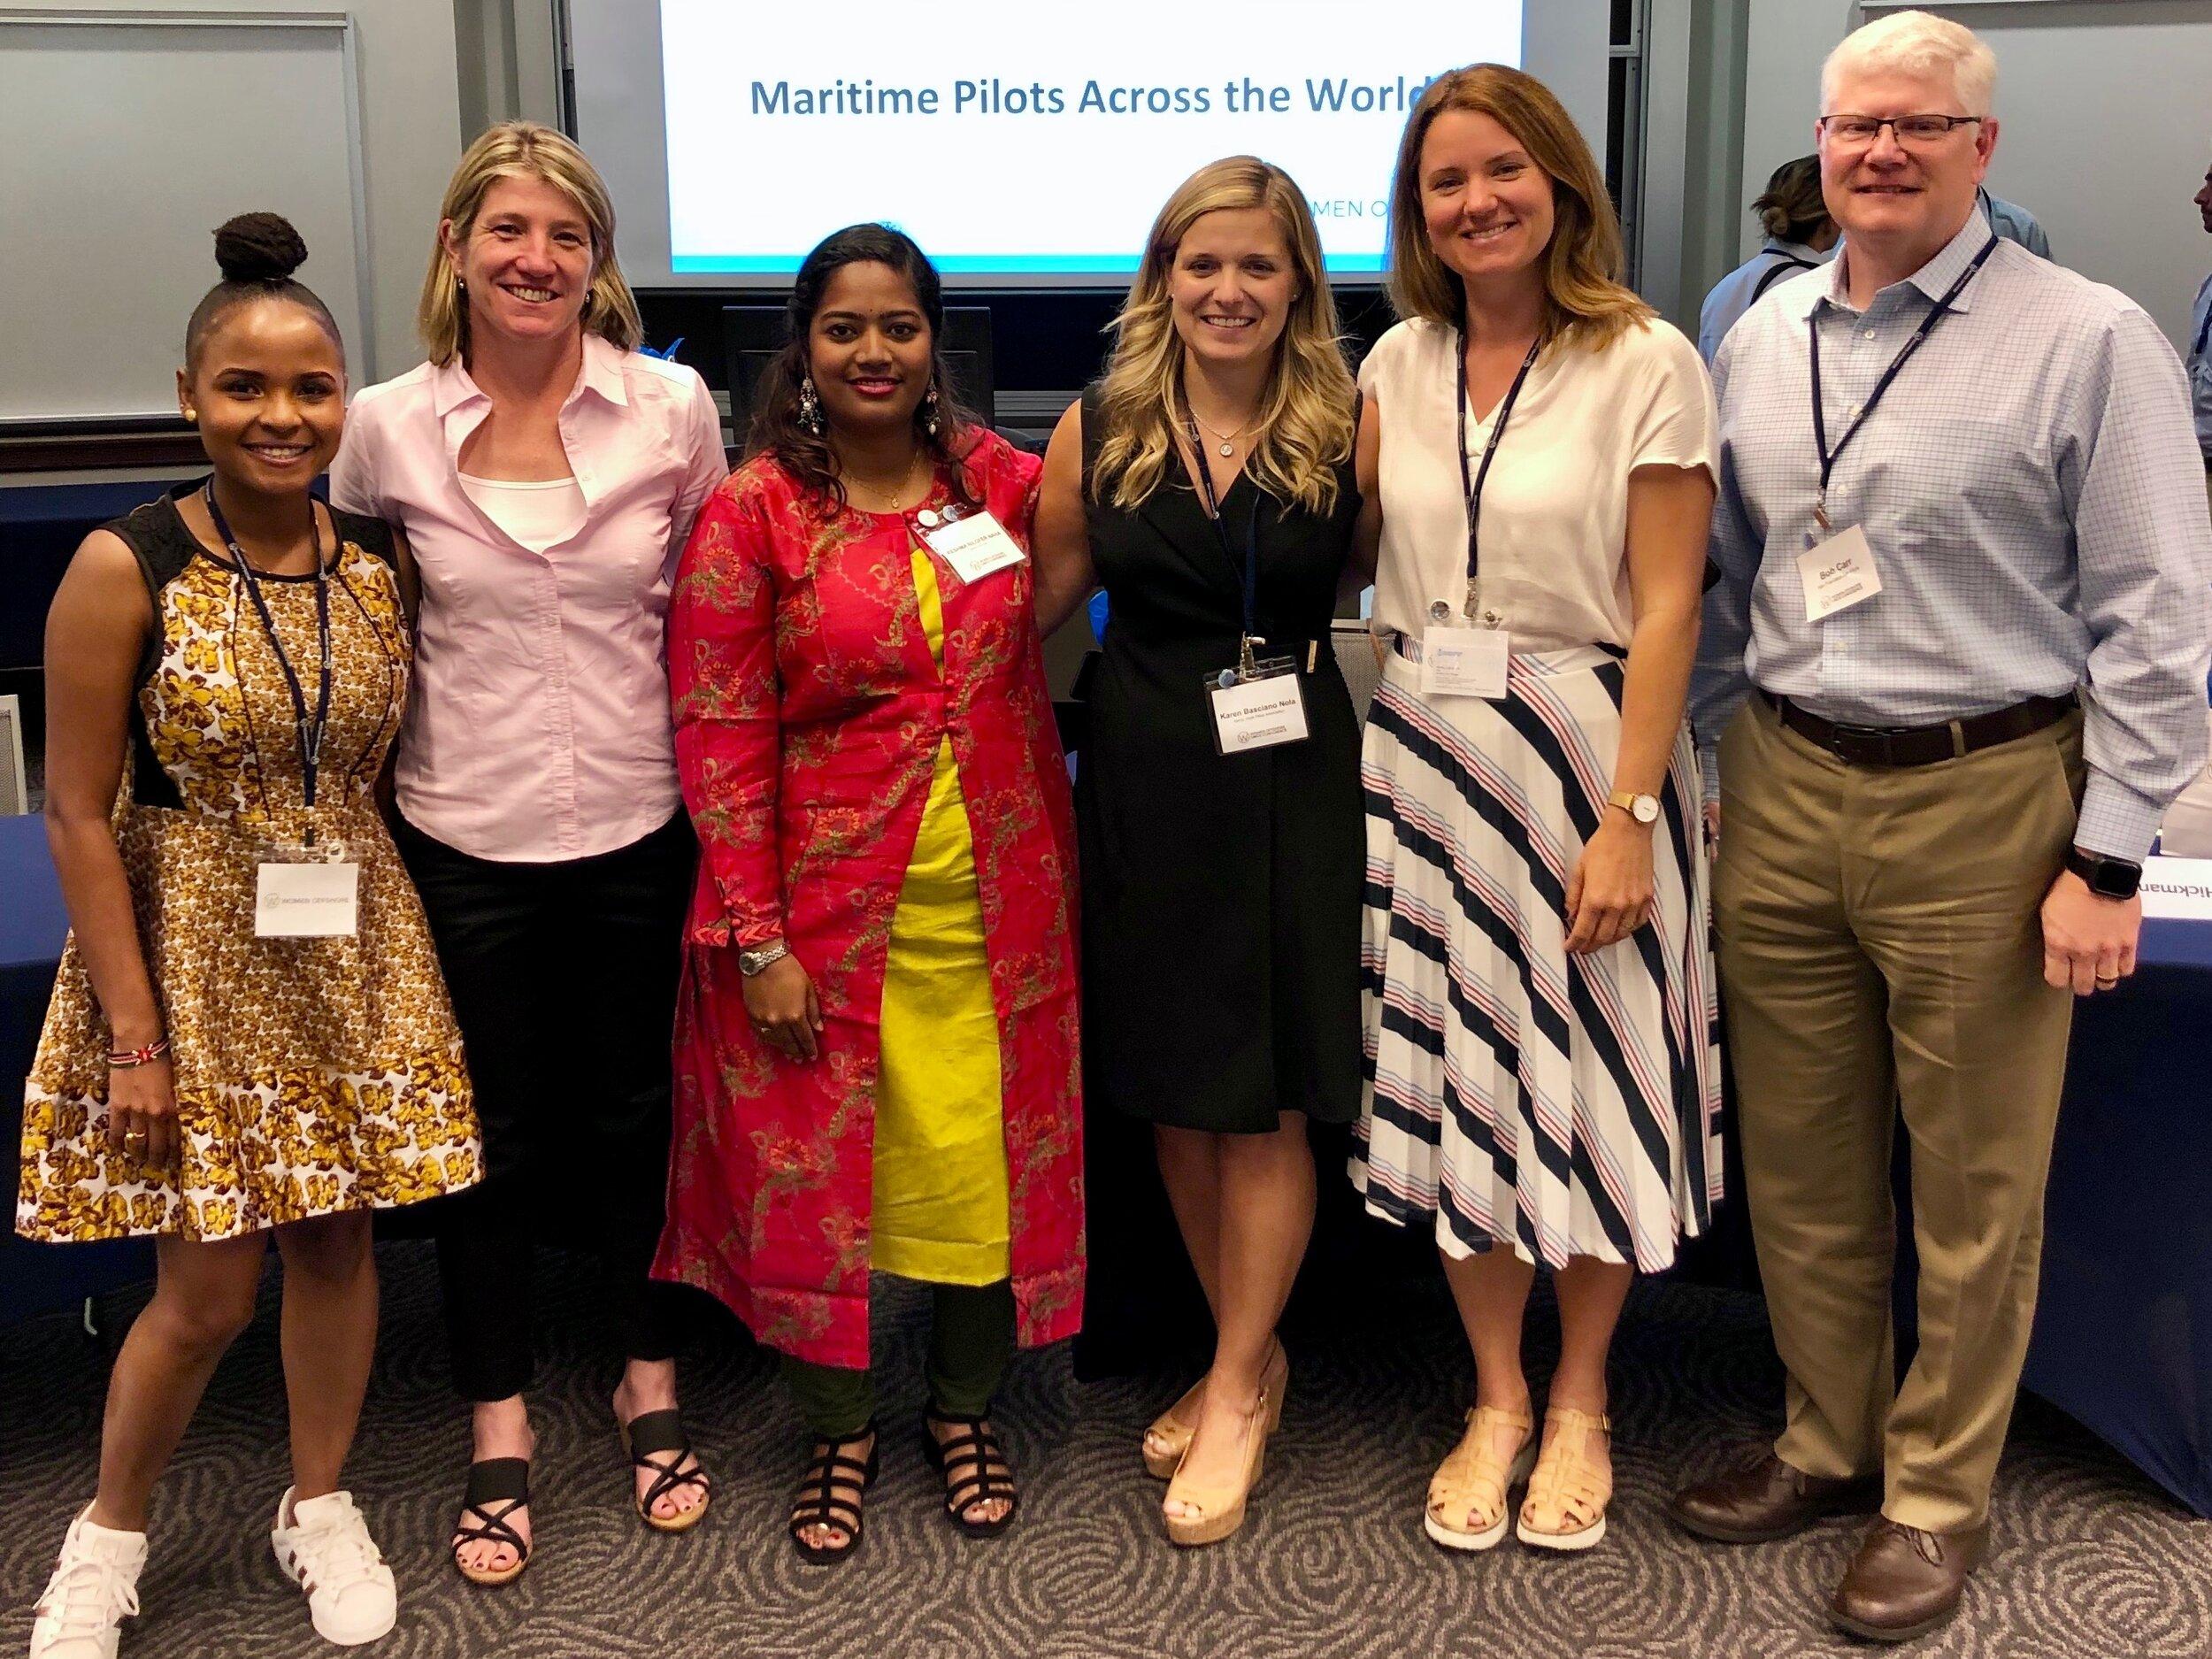 Photo Left to Right: Liz Marami, Captain Josephine Clark, Reshma Nilofer, Captain Karen Nola, Captain Hanna Odengrund, Captain Bob Carr